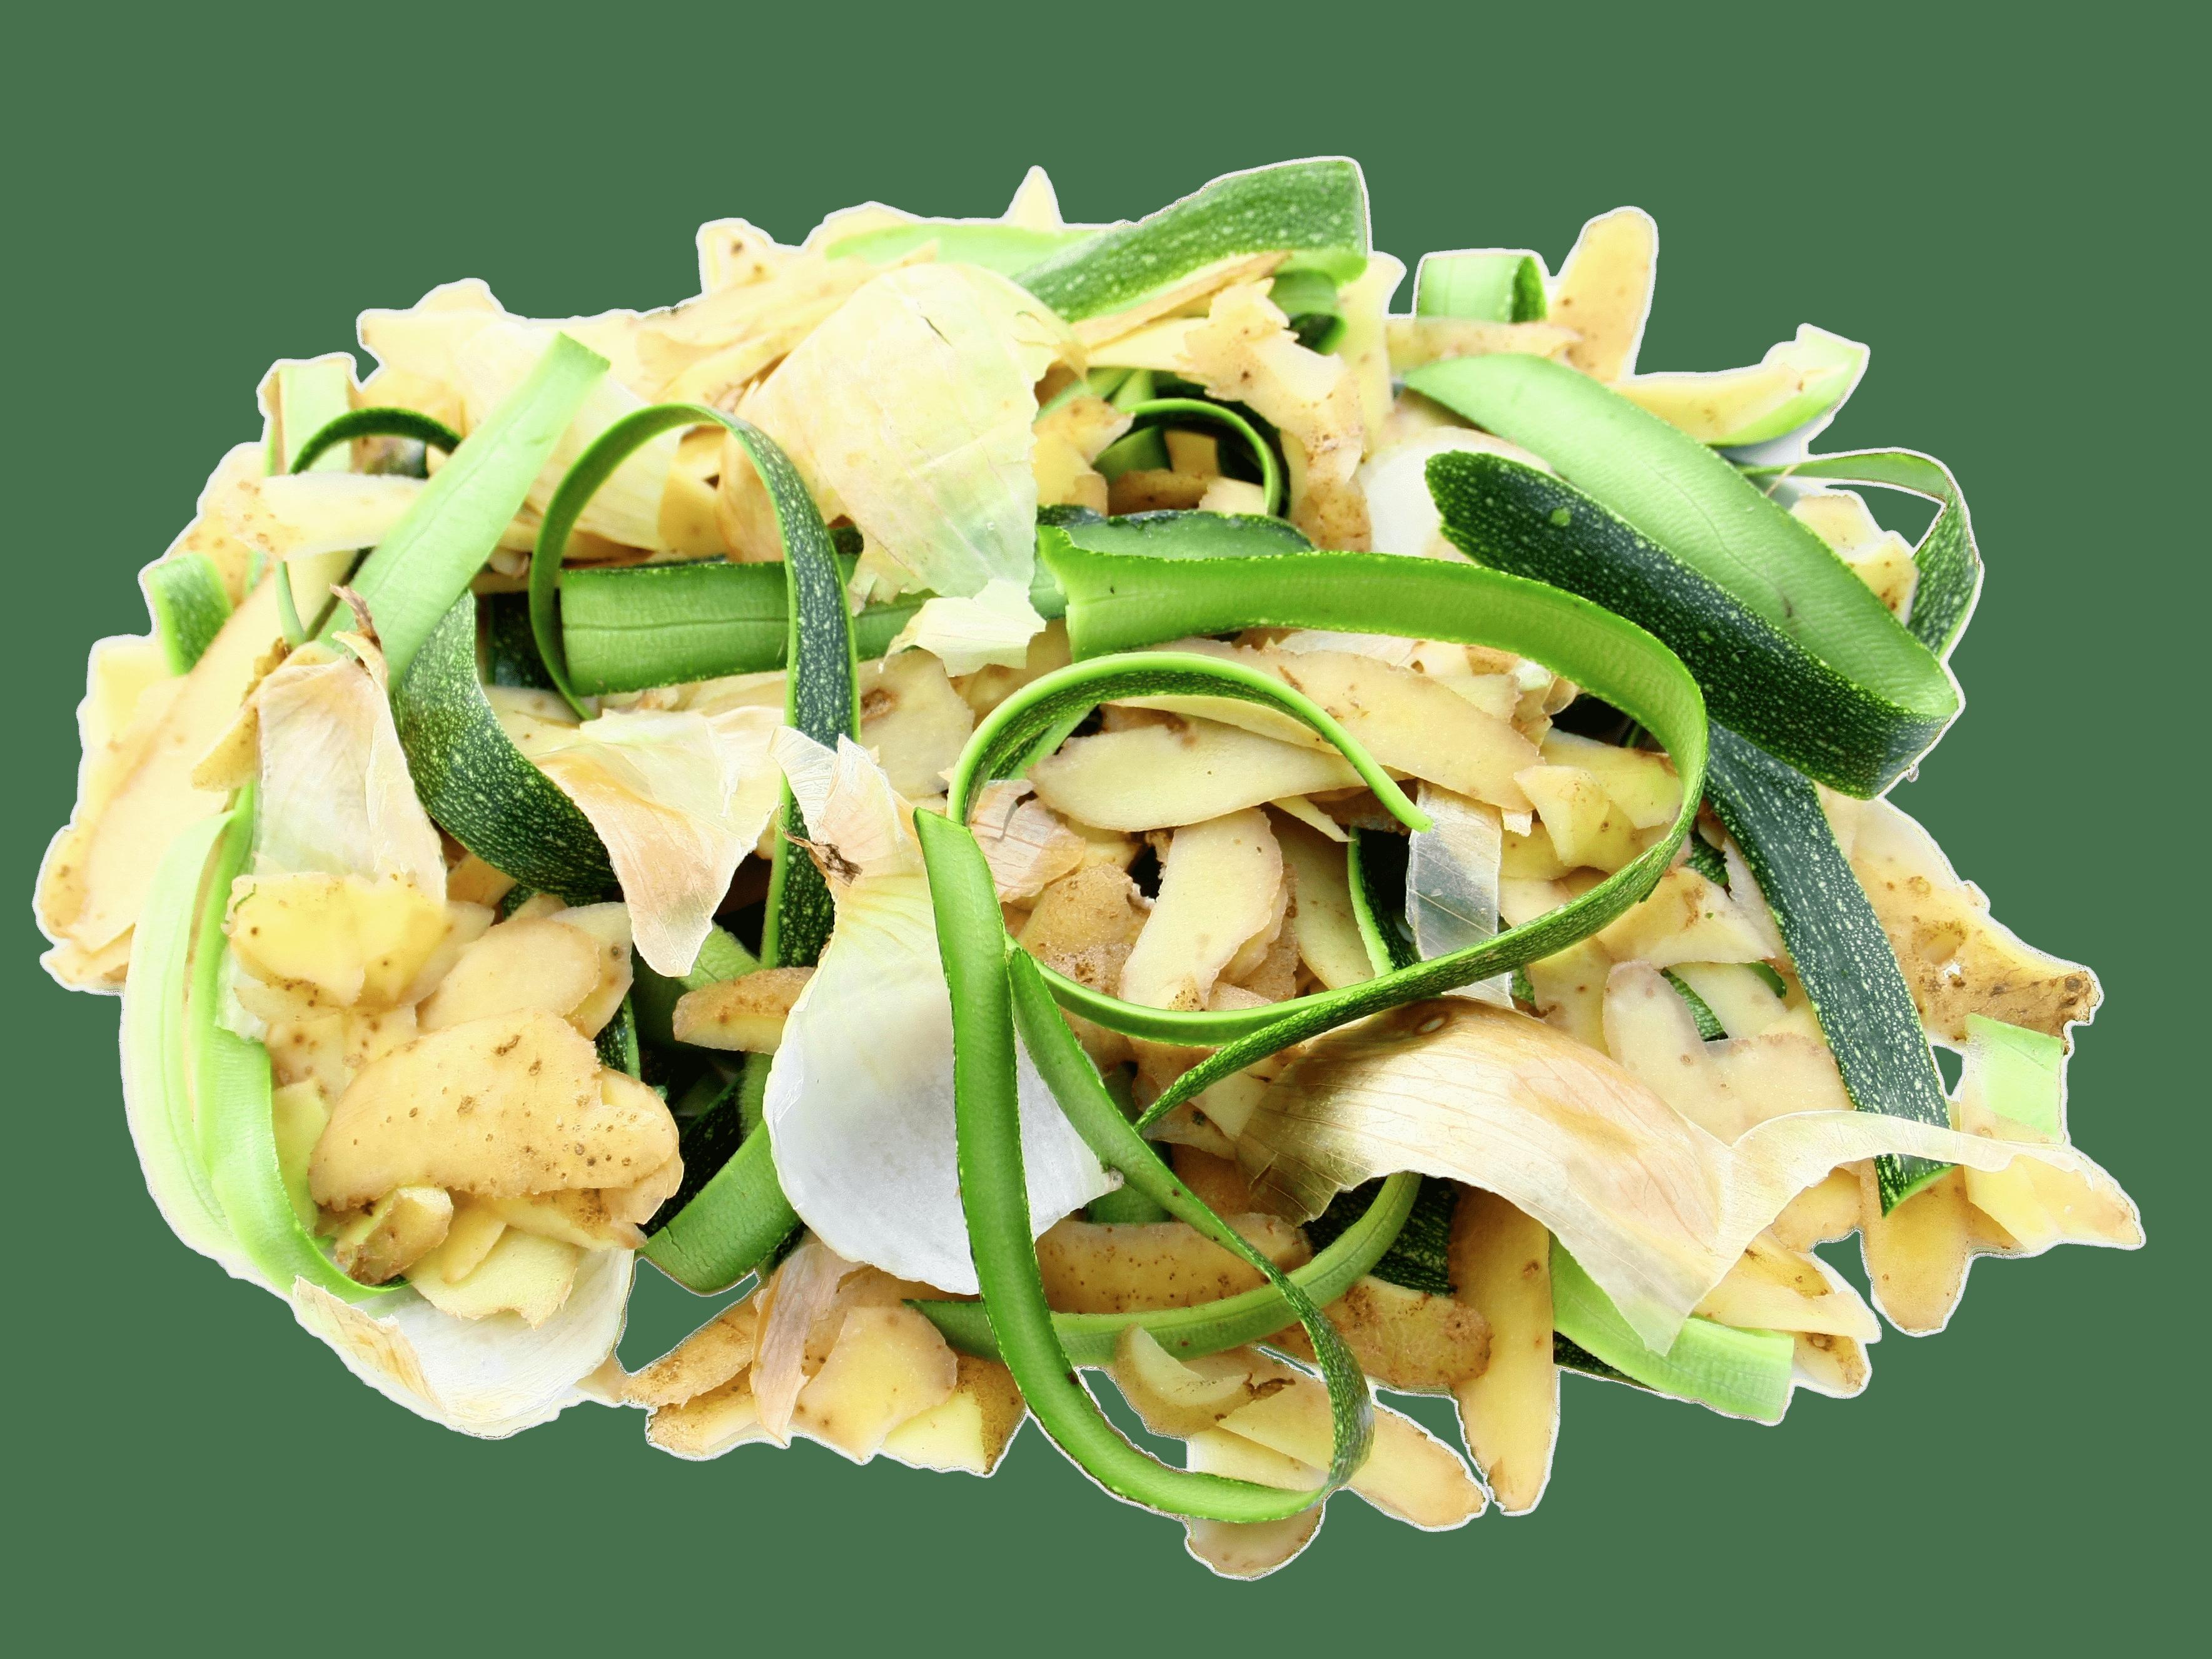 Potato and onion peels. Zucchini clipart vegetable